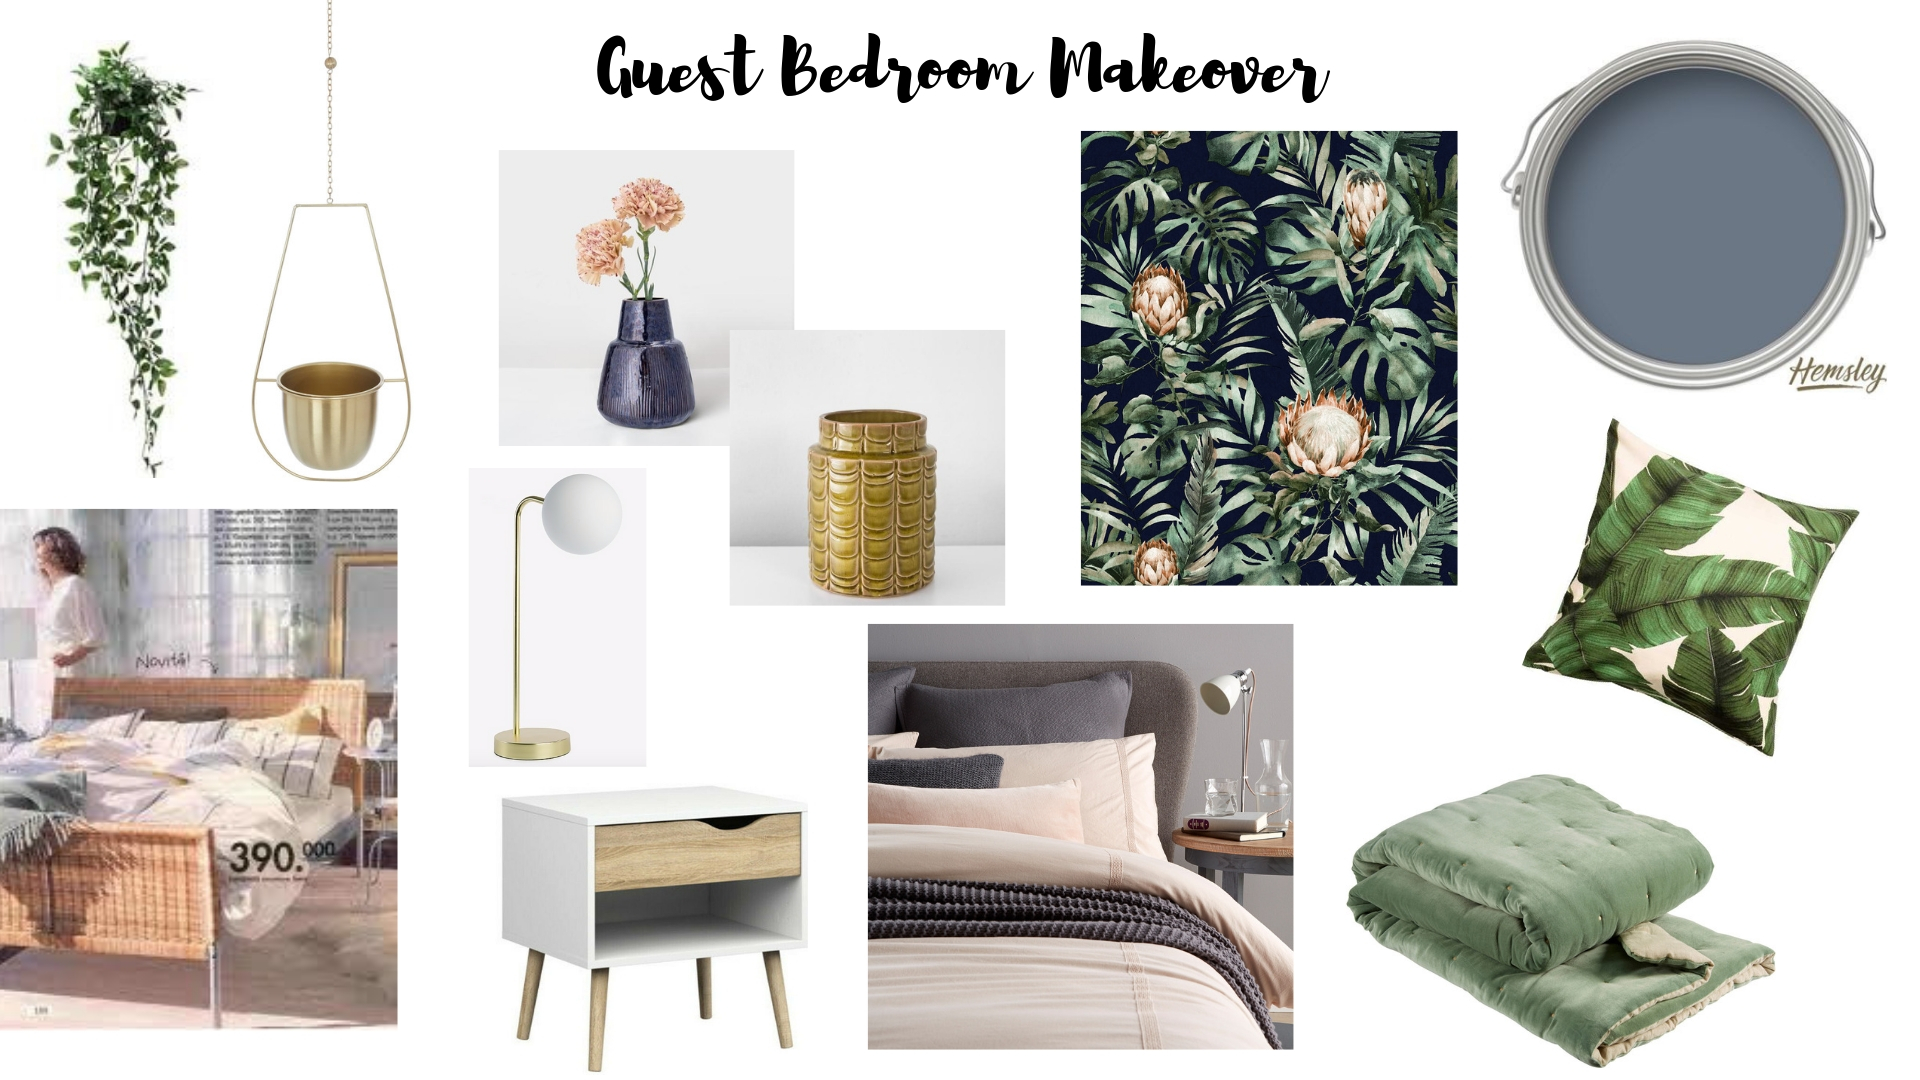 Hotel style bedroom moodboard